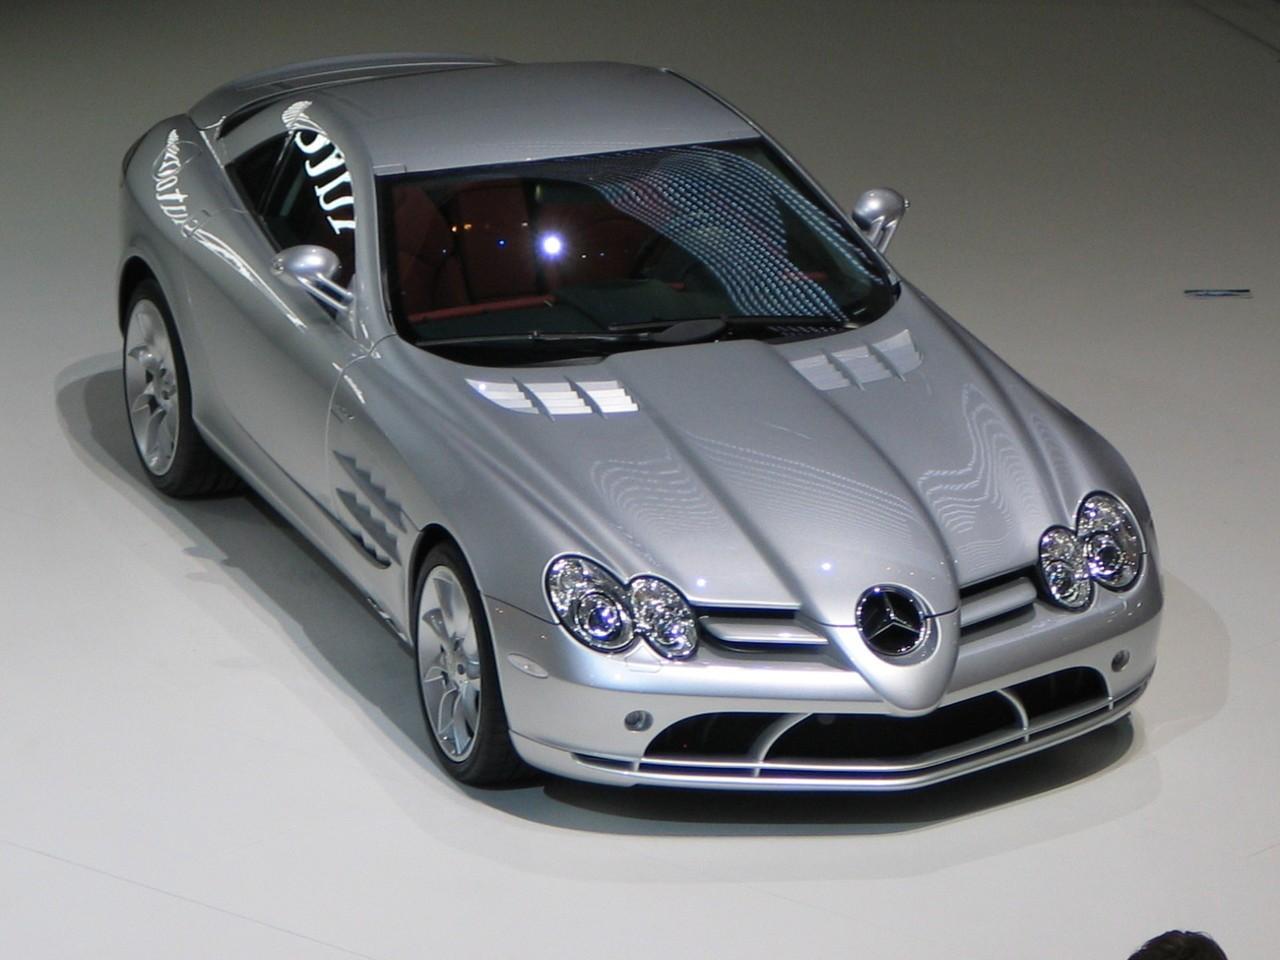 Jaki model Mercedesa kupić?